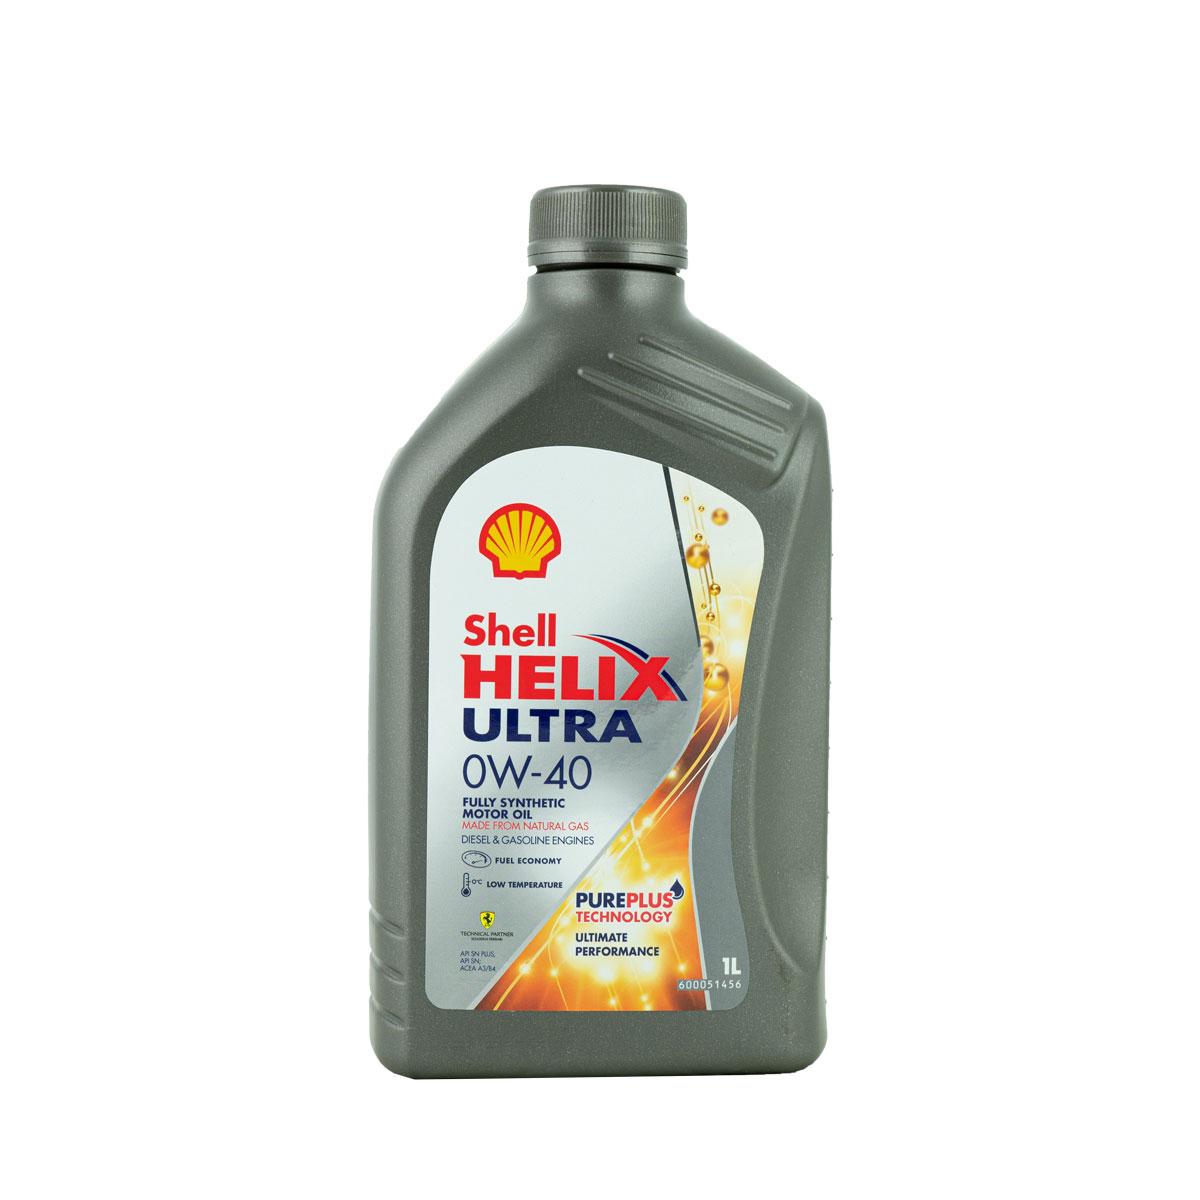 Shell Helix Ultra 0W-40 Motoröl, 1l